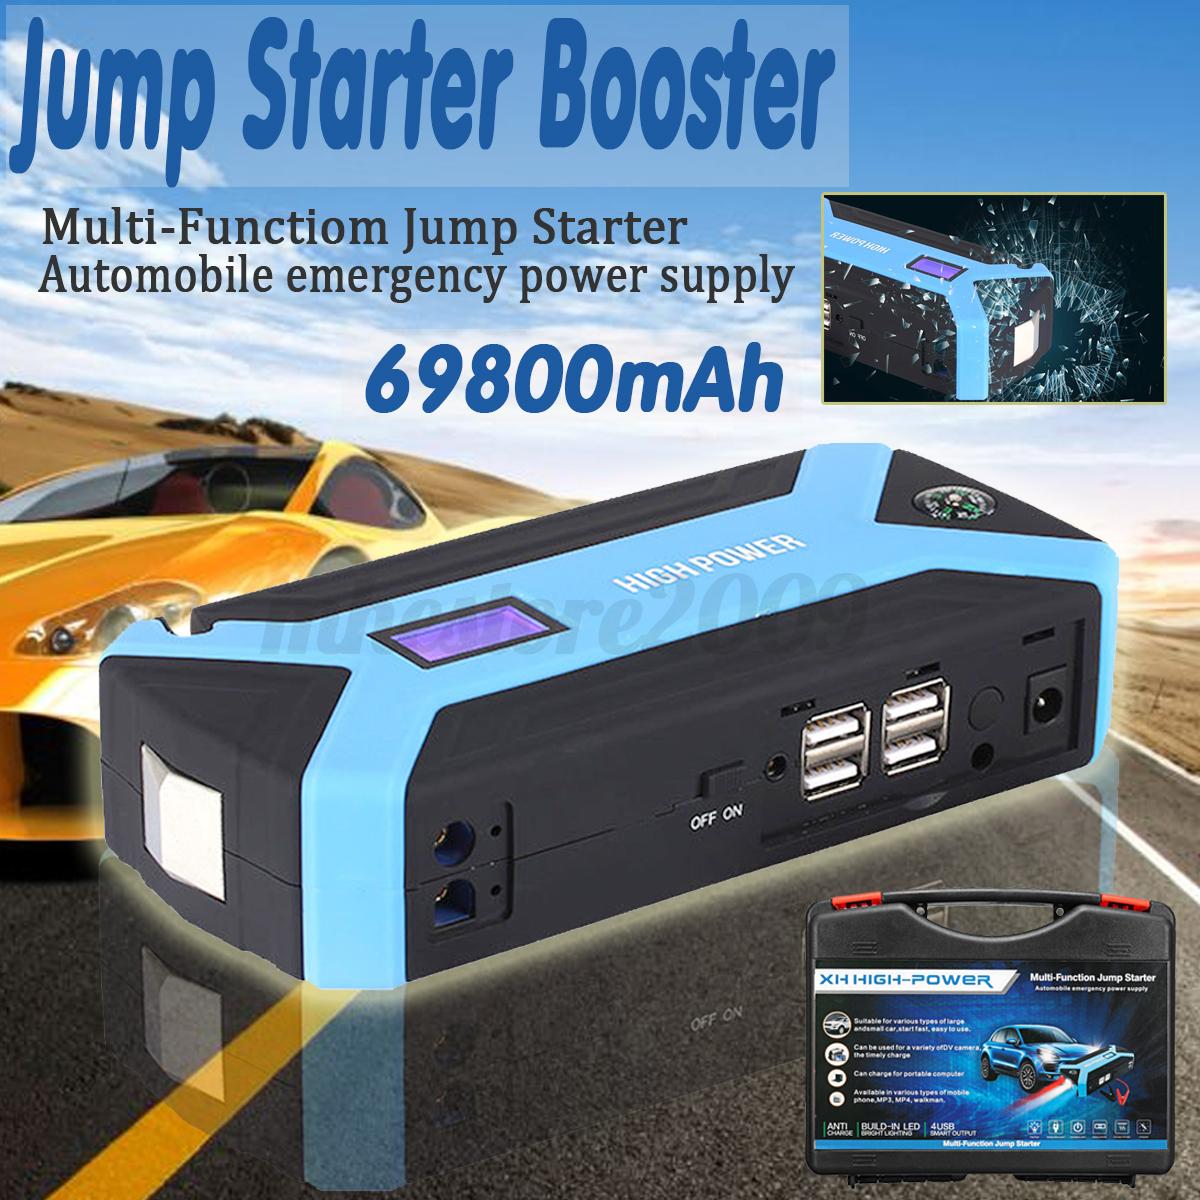 Sh Solong Complete Tattoo Kit 10 Wrap Coils Guns Machine Power Source · 68800mAh 82800mAh Car Jump Starter 4 USB Emergency